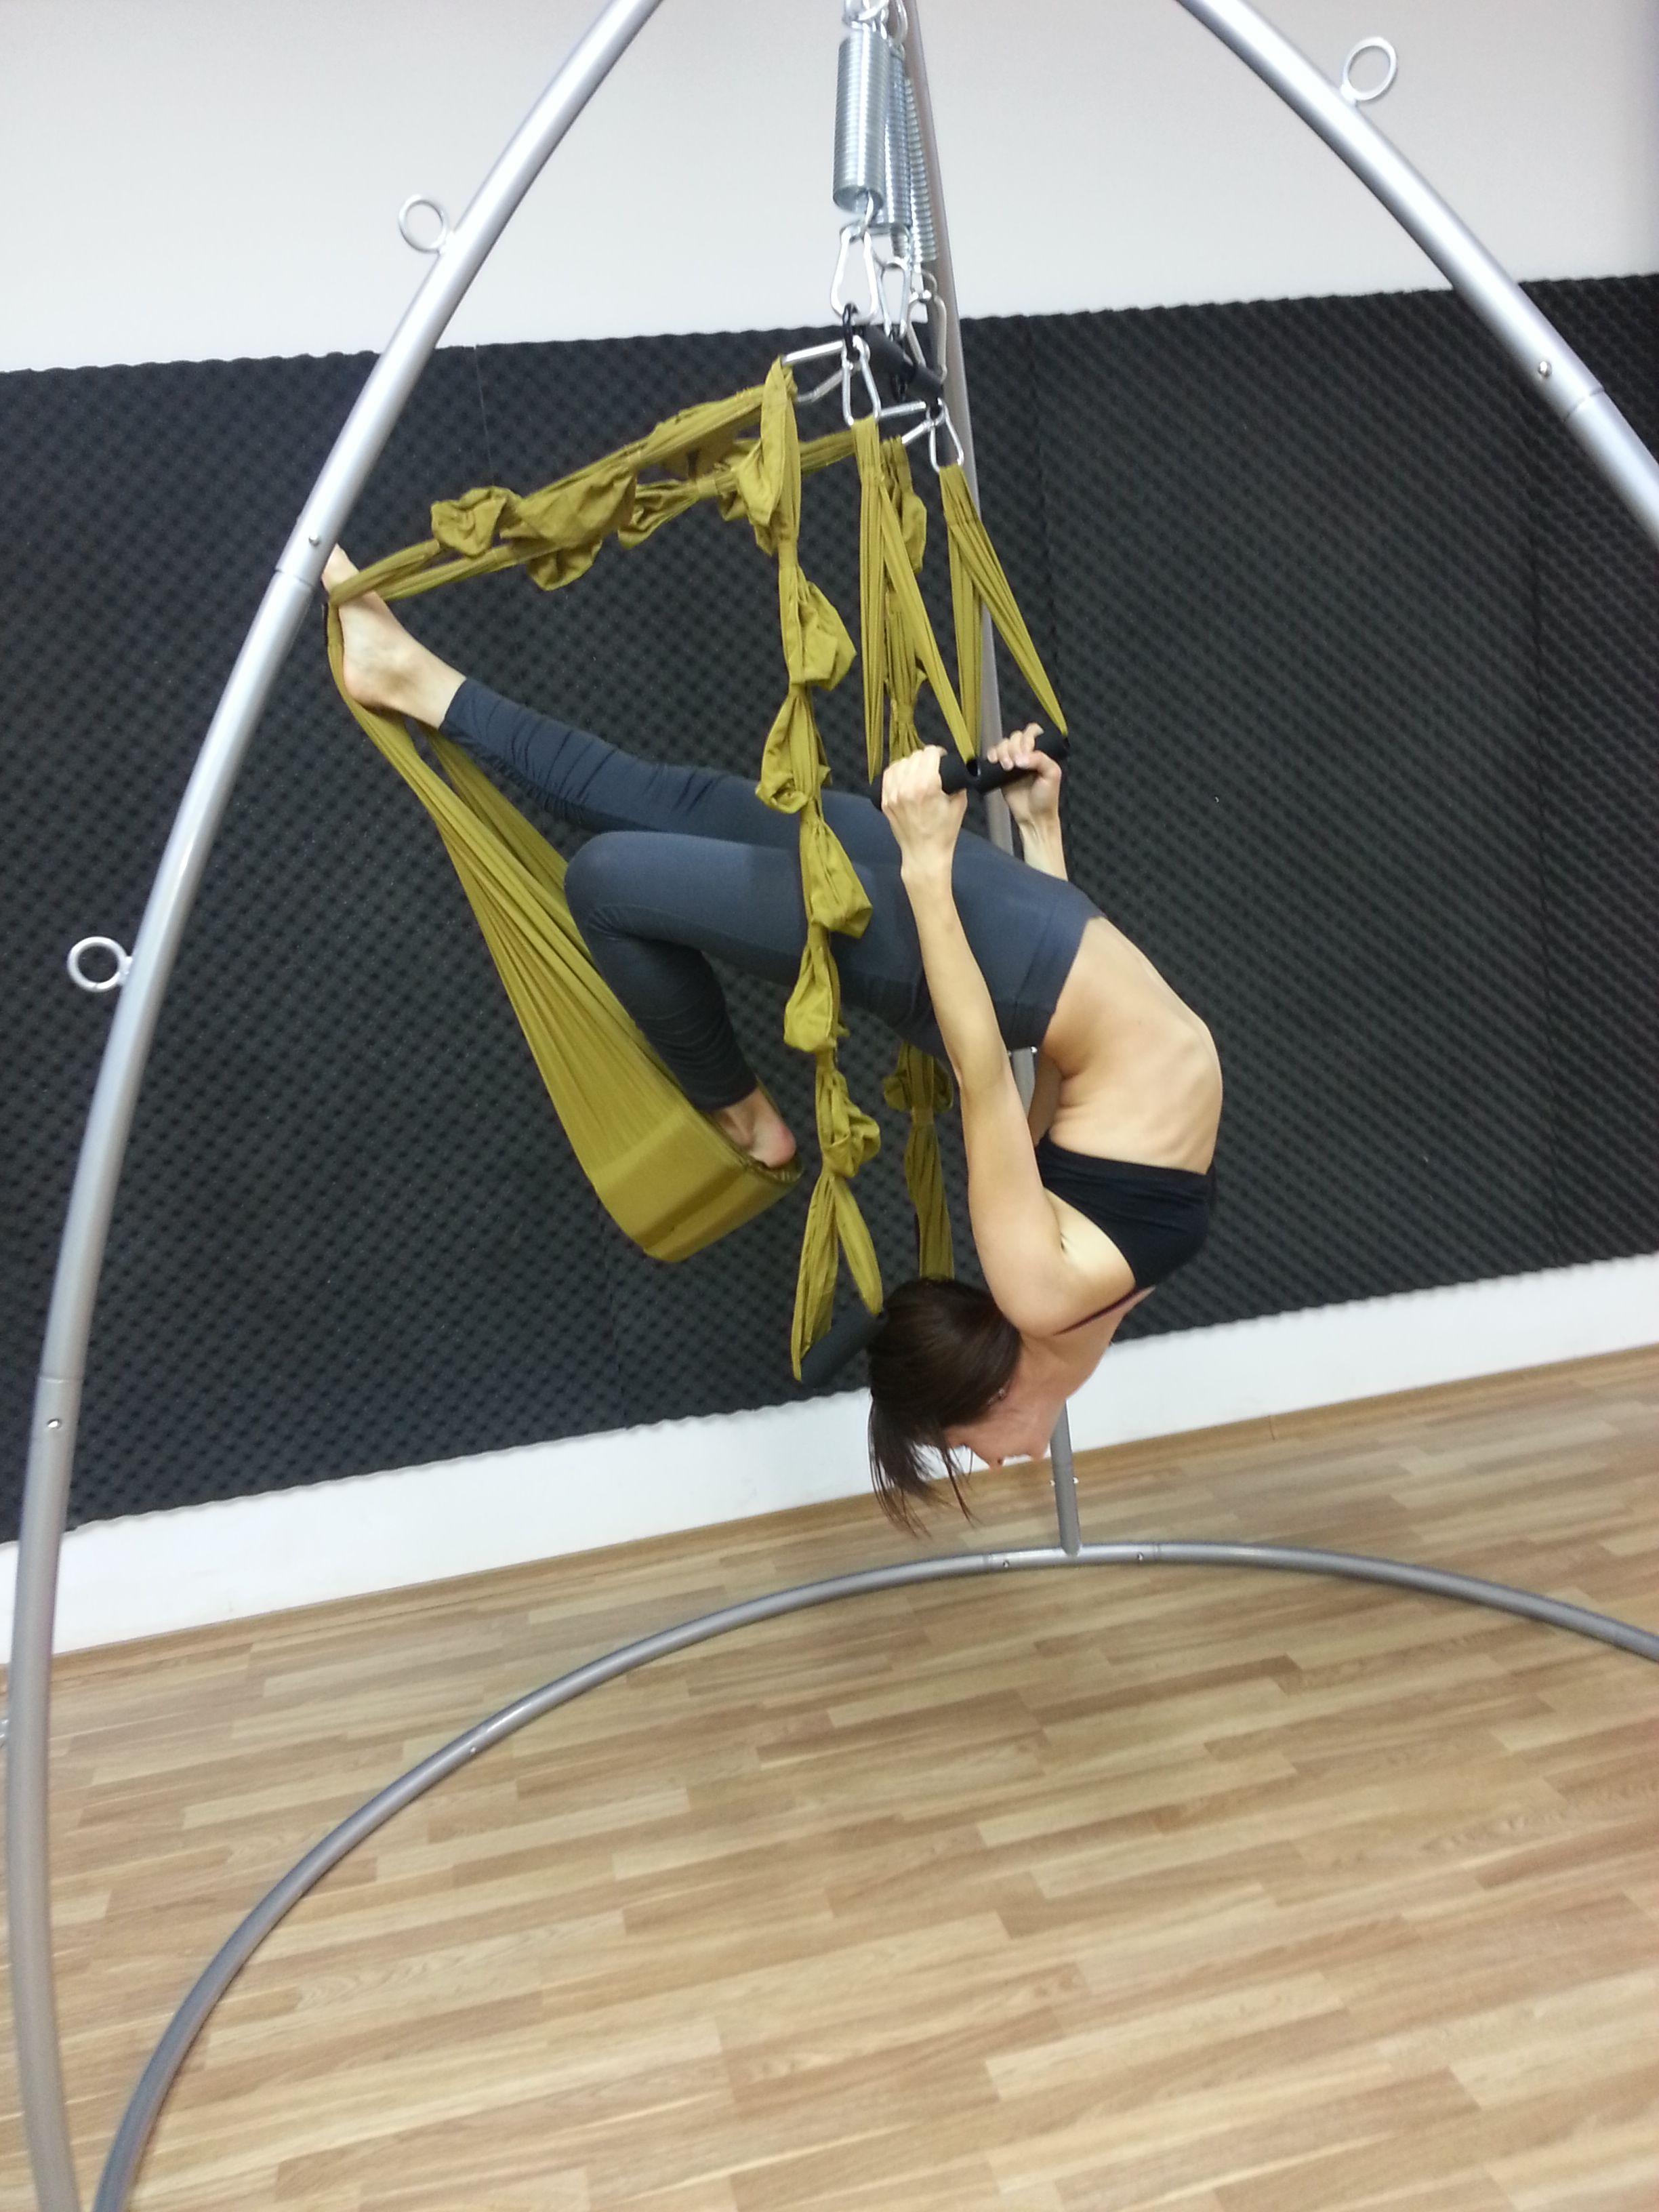 Aerial yoga pose fitspiration pinterest aerial yoga yoga